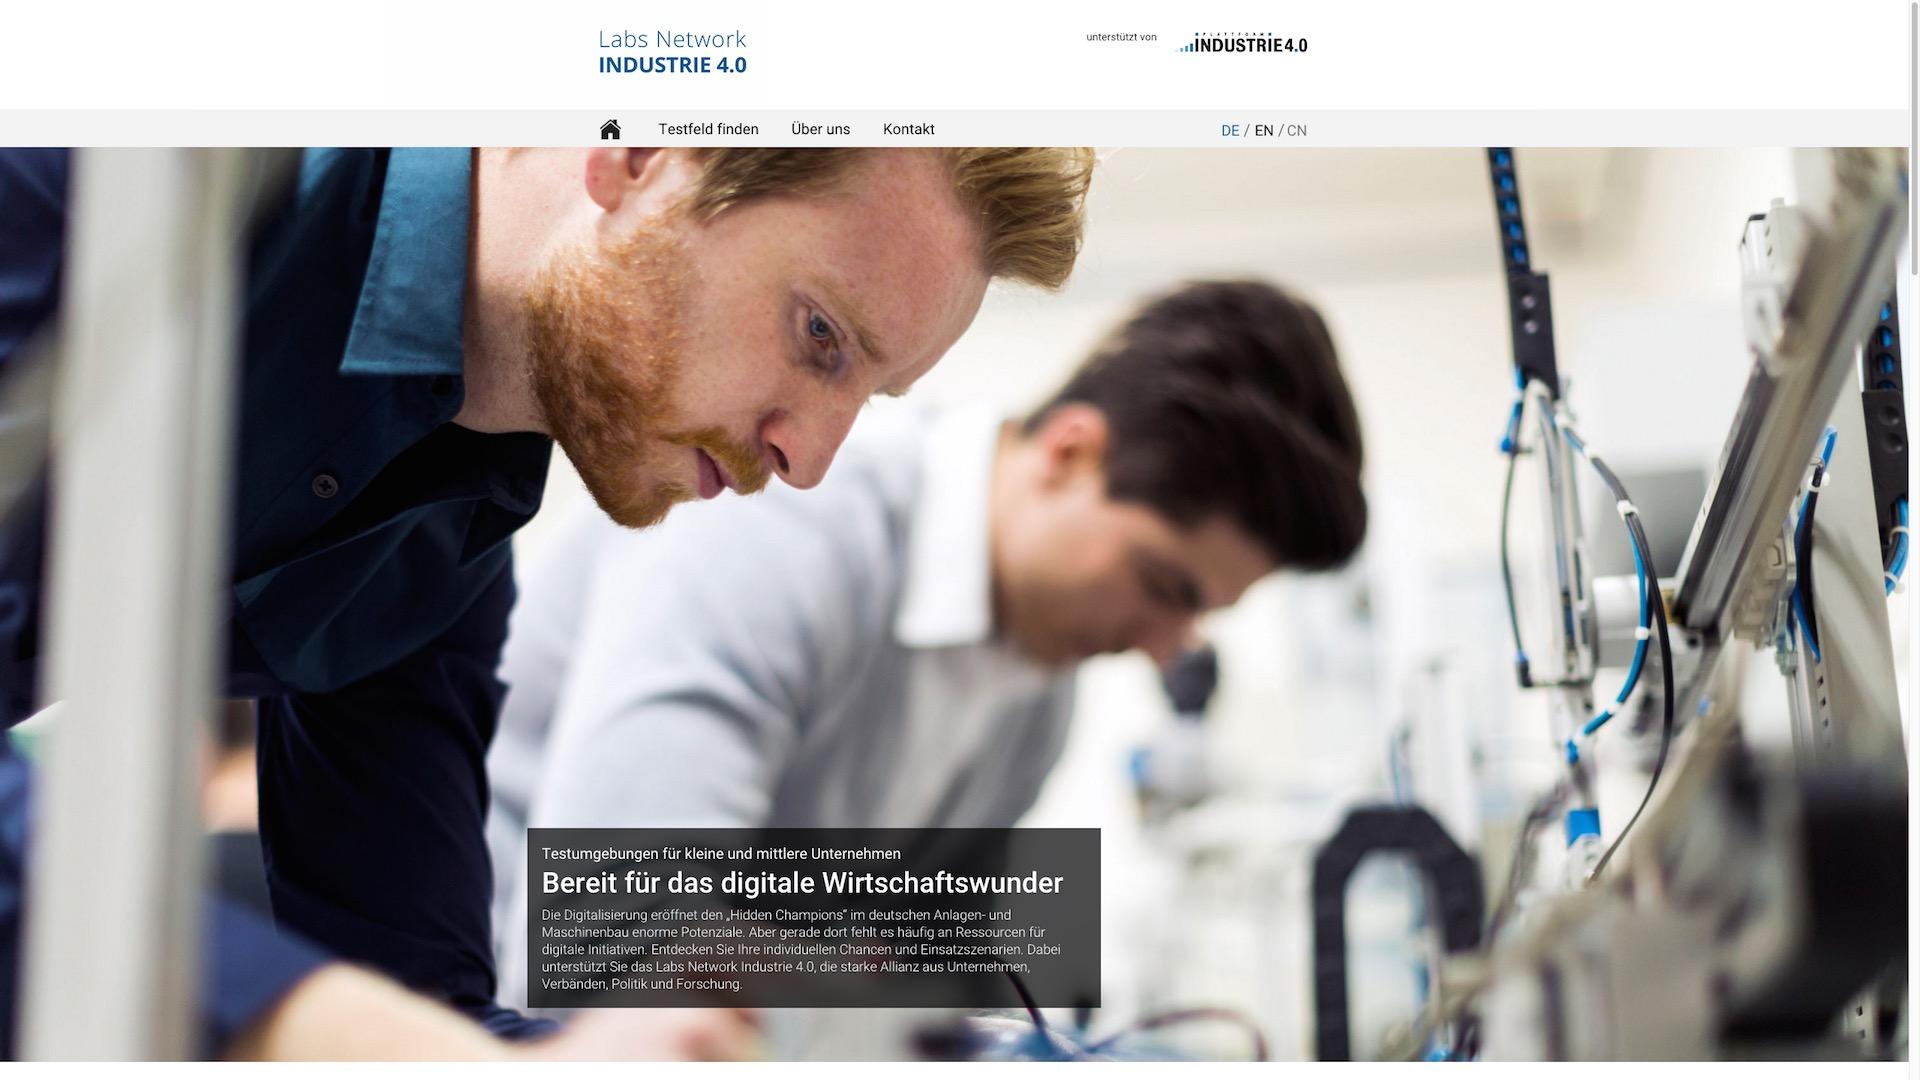 Labs Network INDUSTRIE 4.0 - Responsive Landingpage